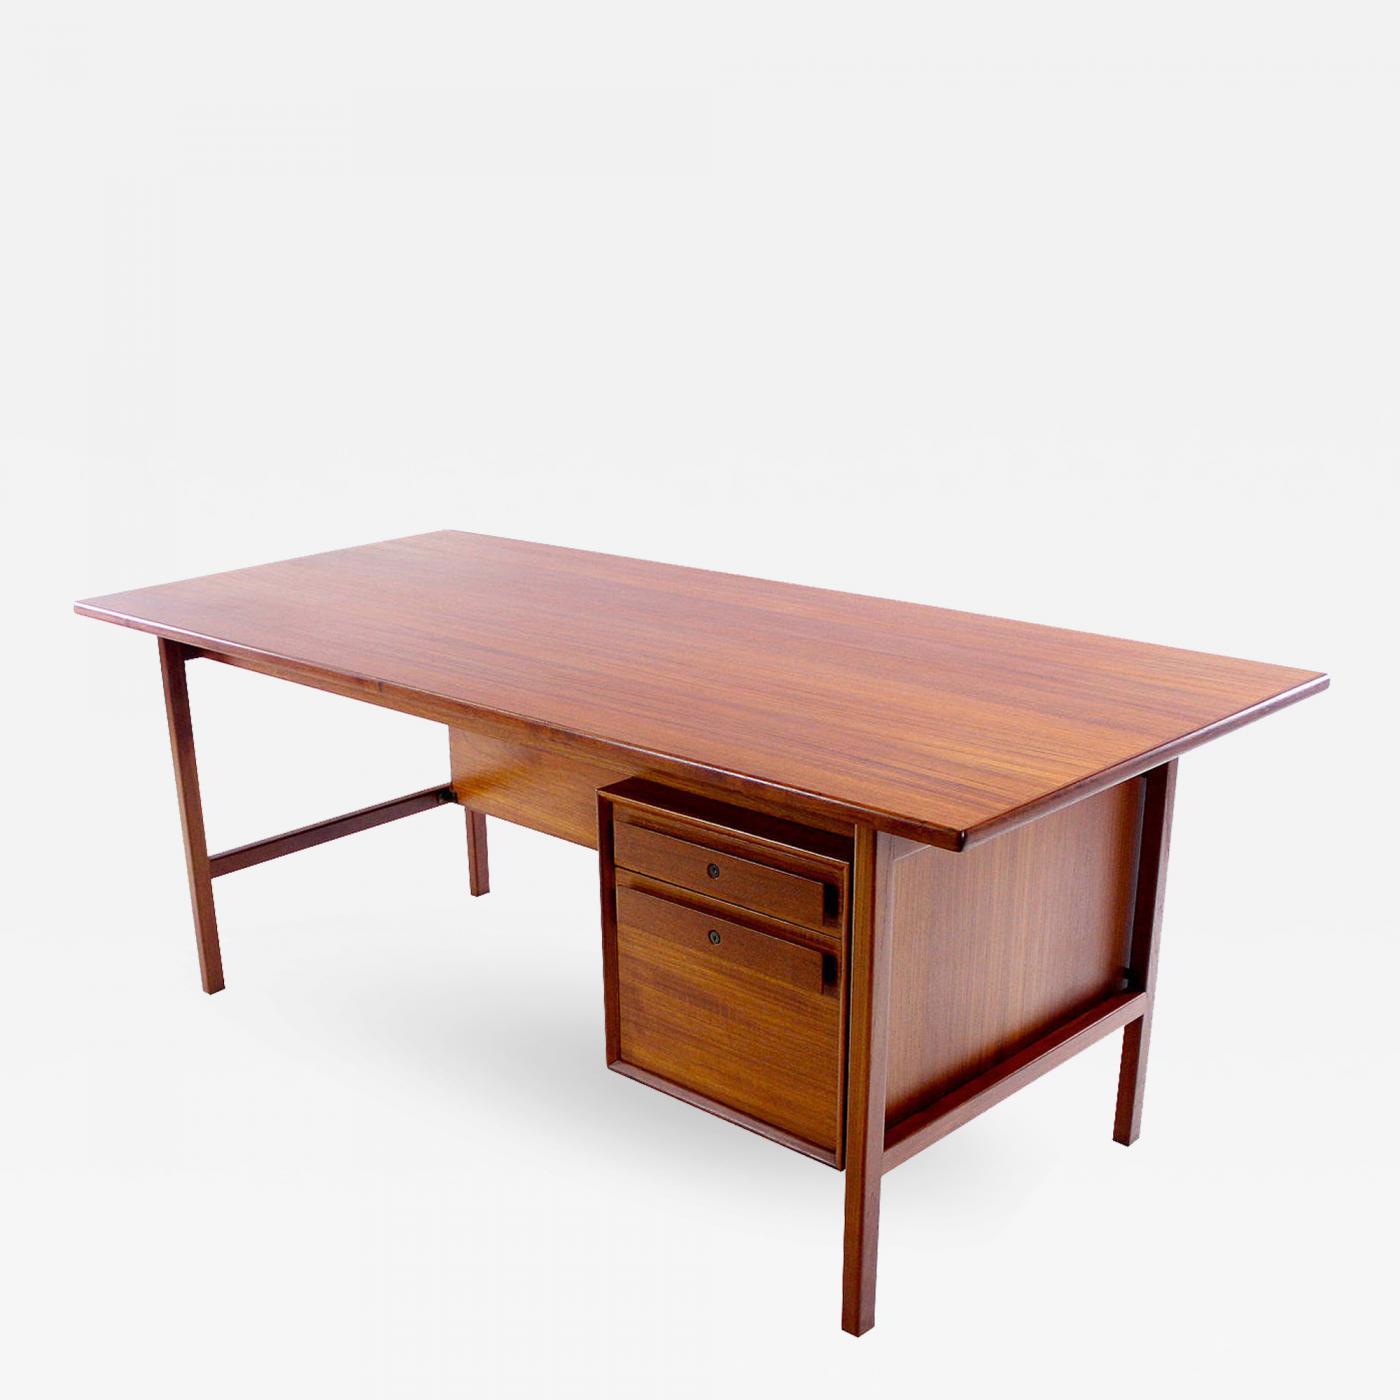 Ordinaire Listings / Furniture / Tables / Desks U0026 Writing Tables